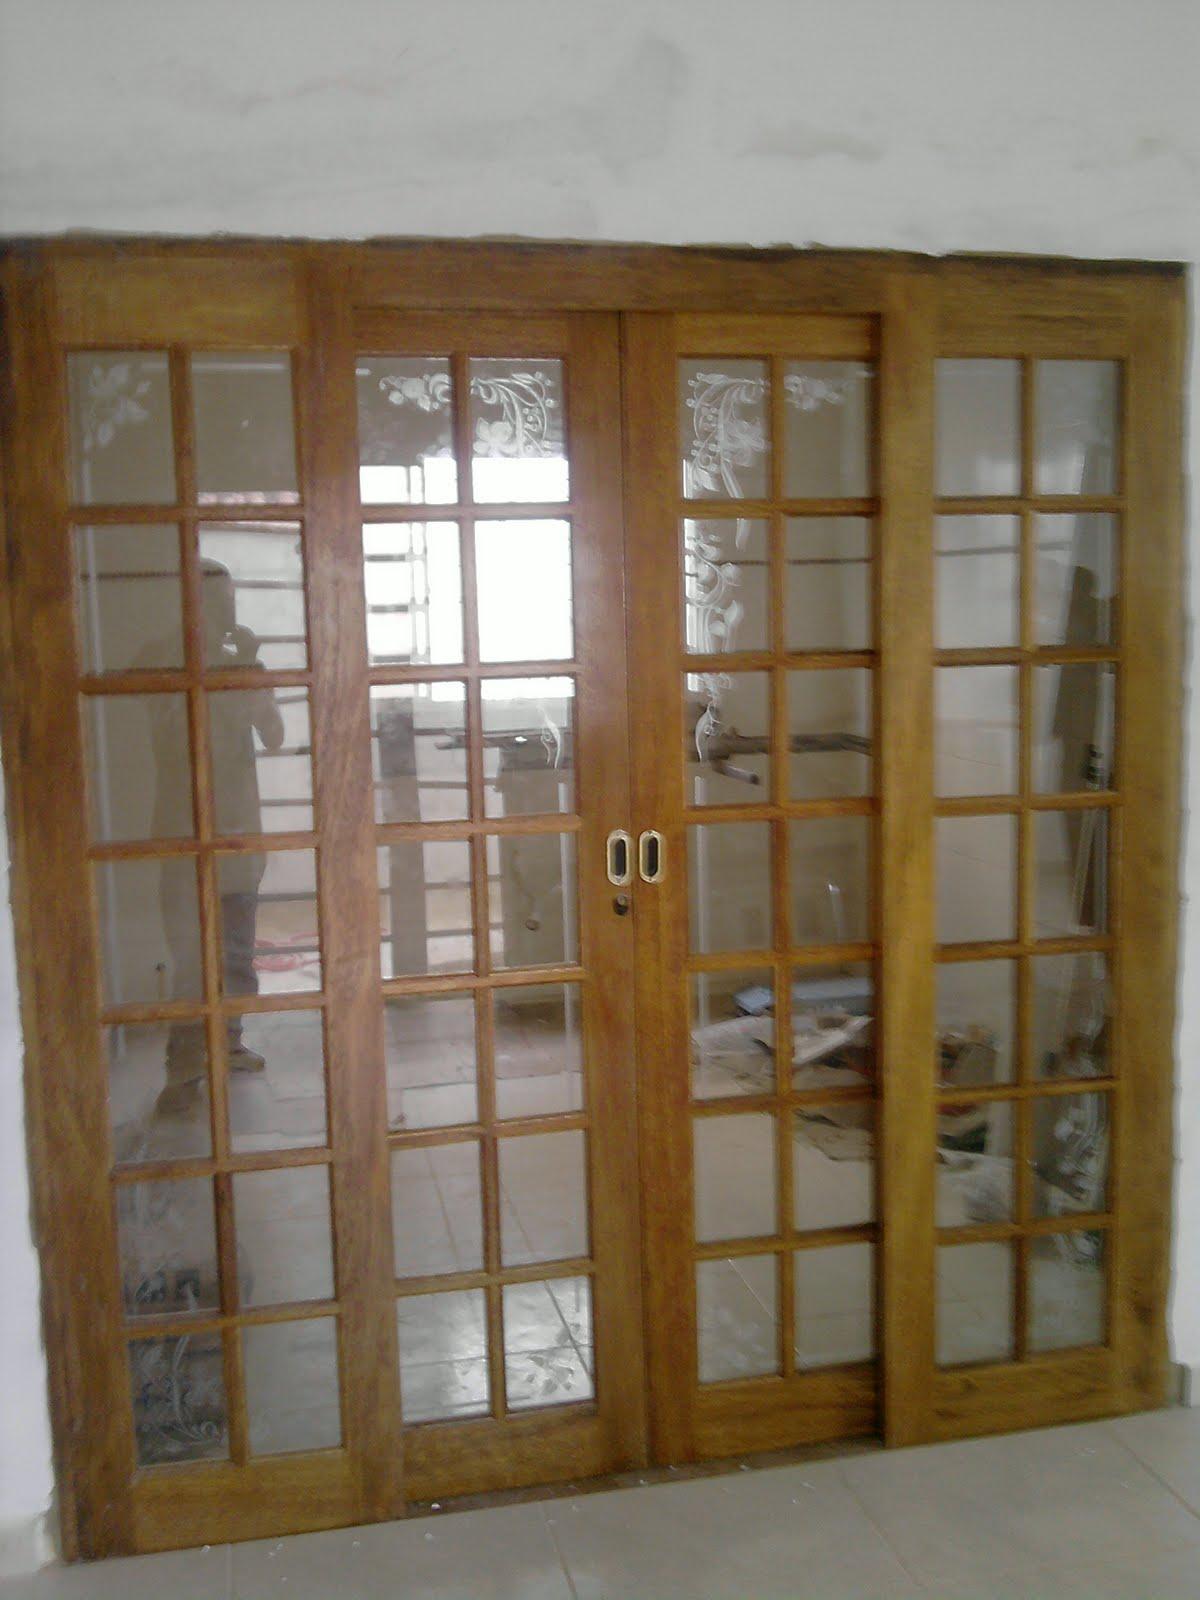 #654824 VIDROS JATEADOS e TEMPERADOS: janelas jateadas e desenhos sombreados 1570 Vidros E Janelas